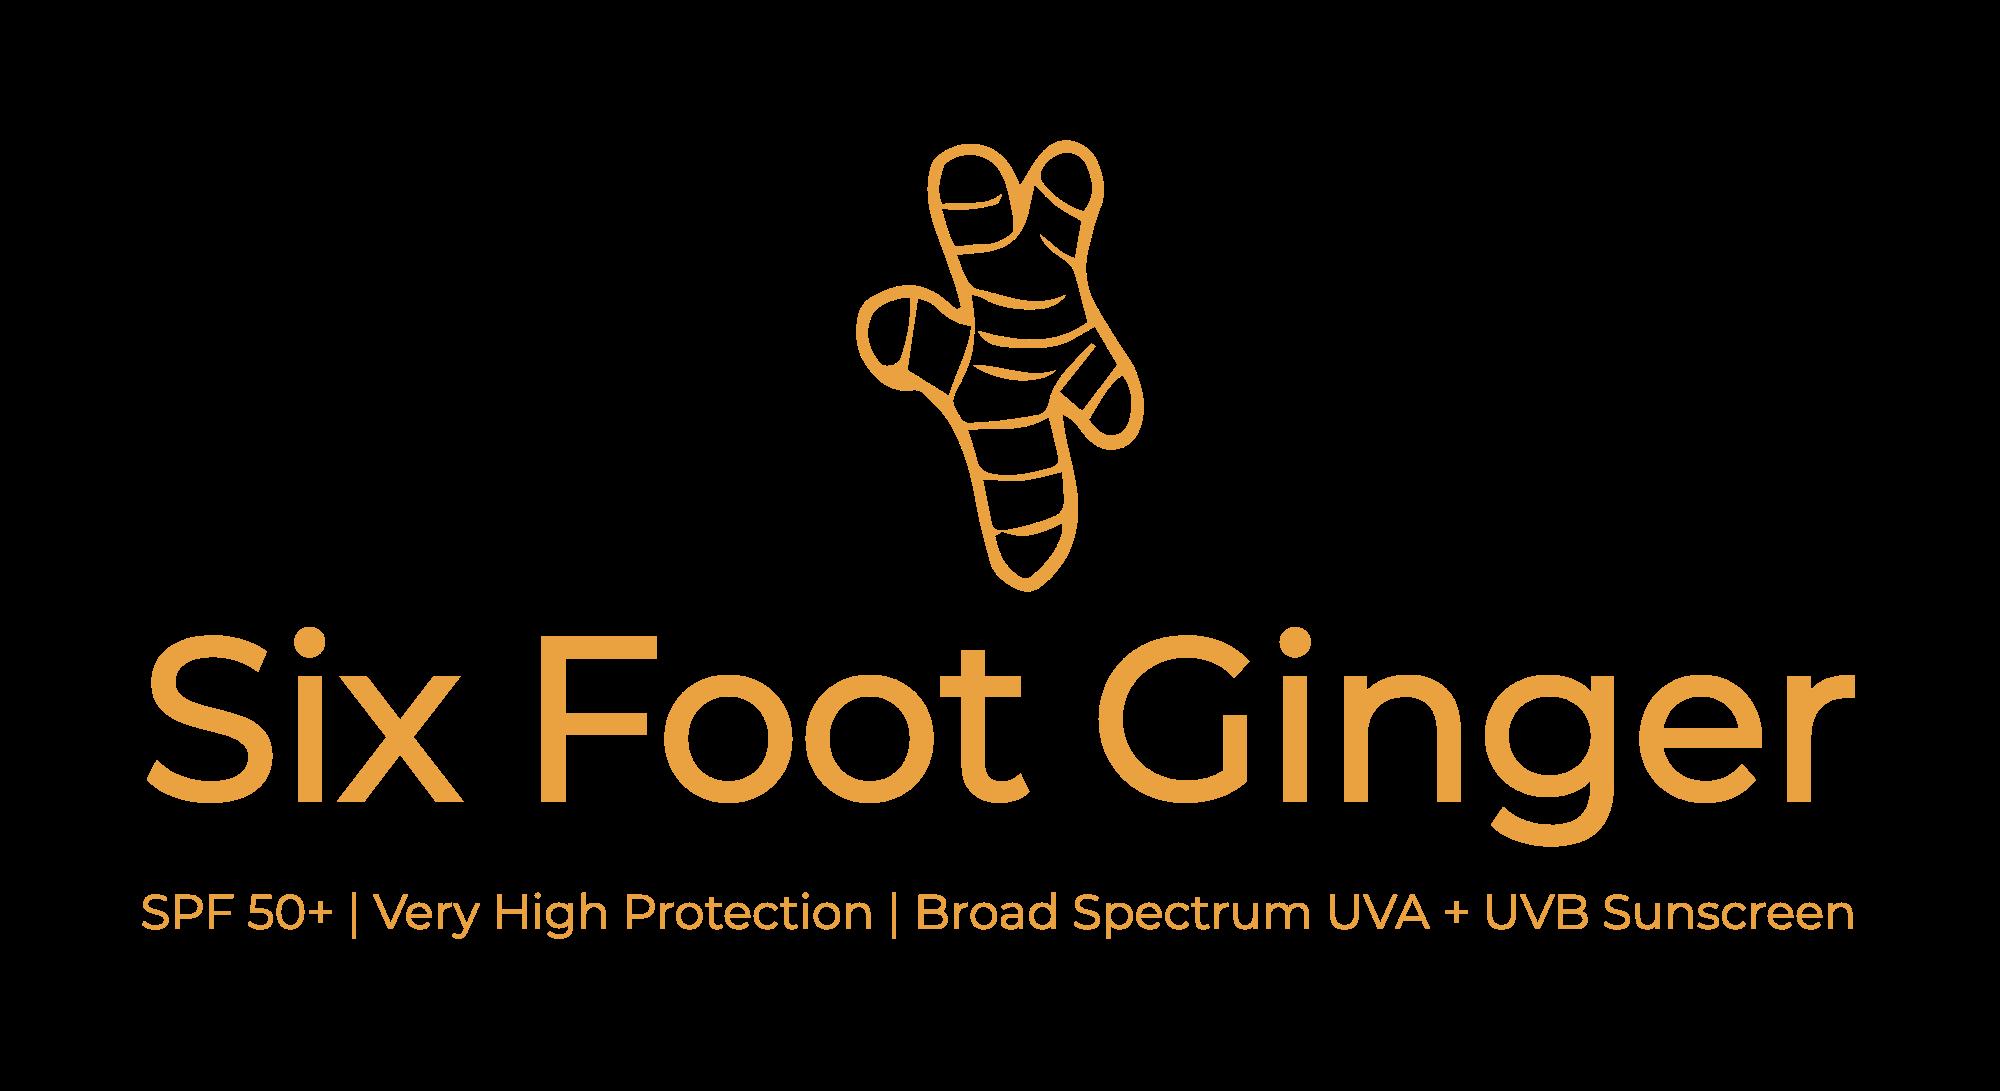 Six Foot Ginger-logo.png